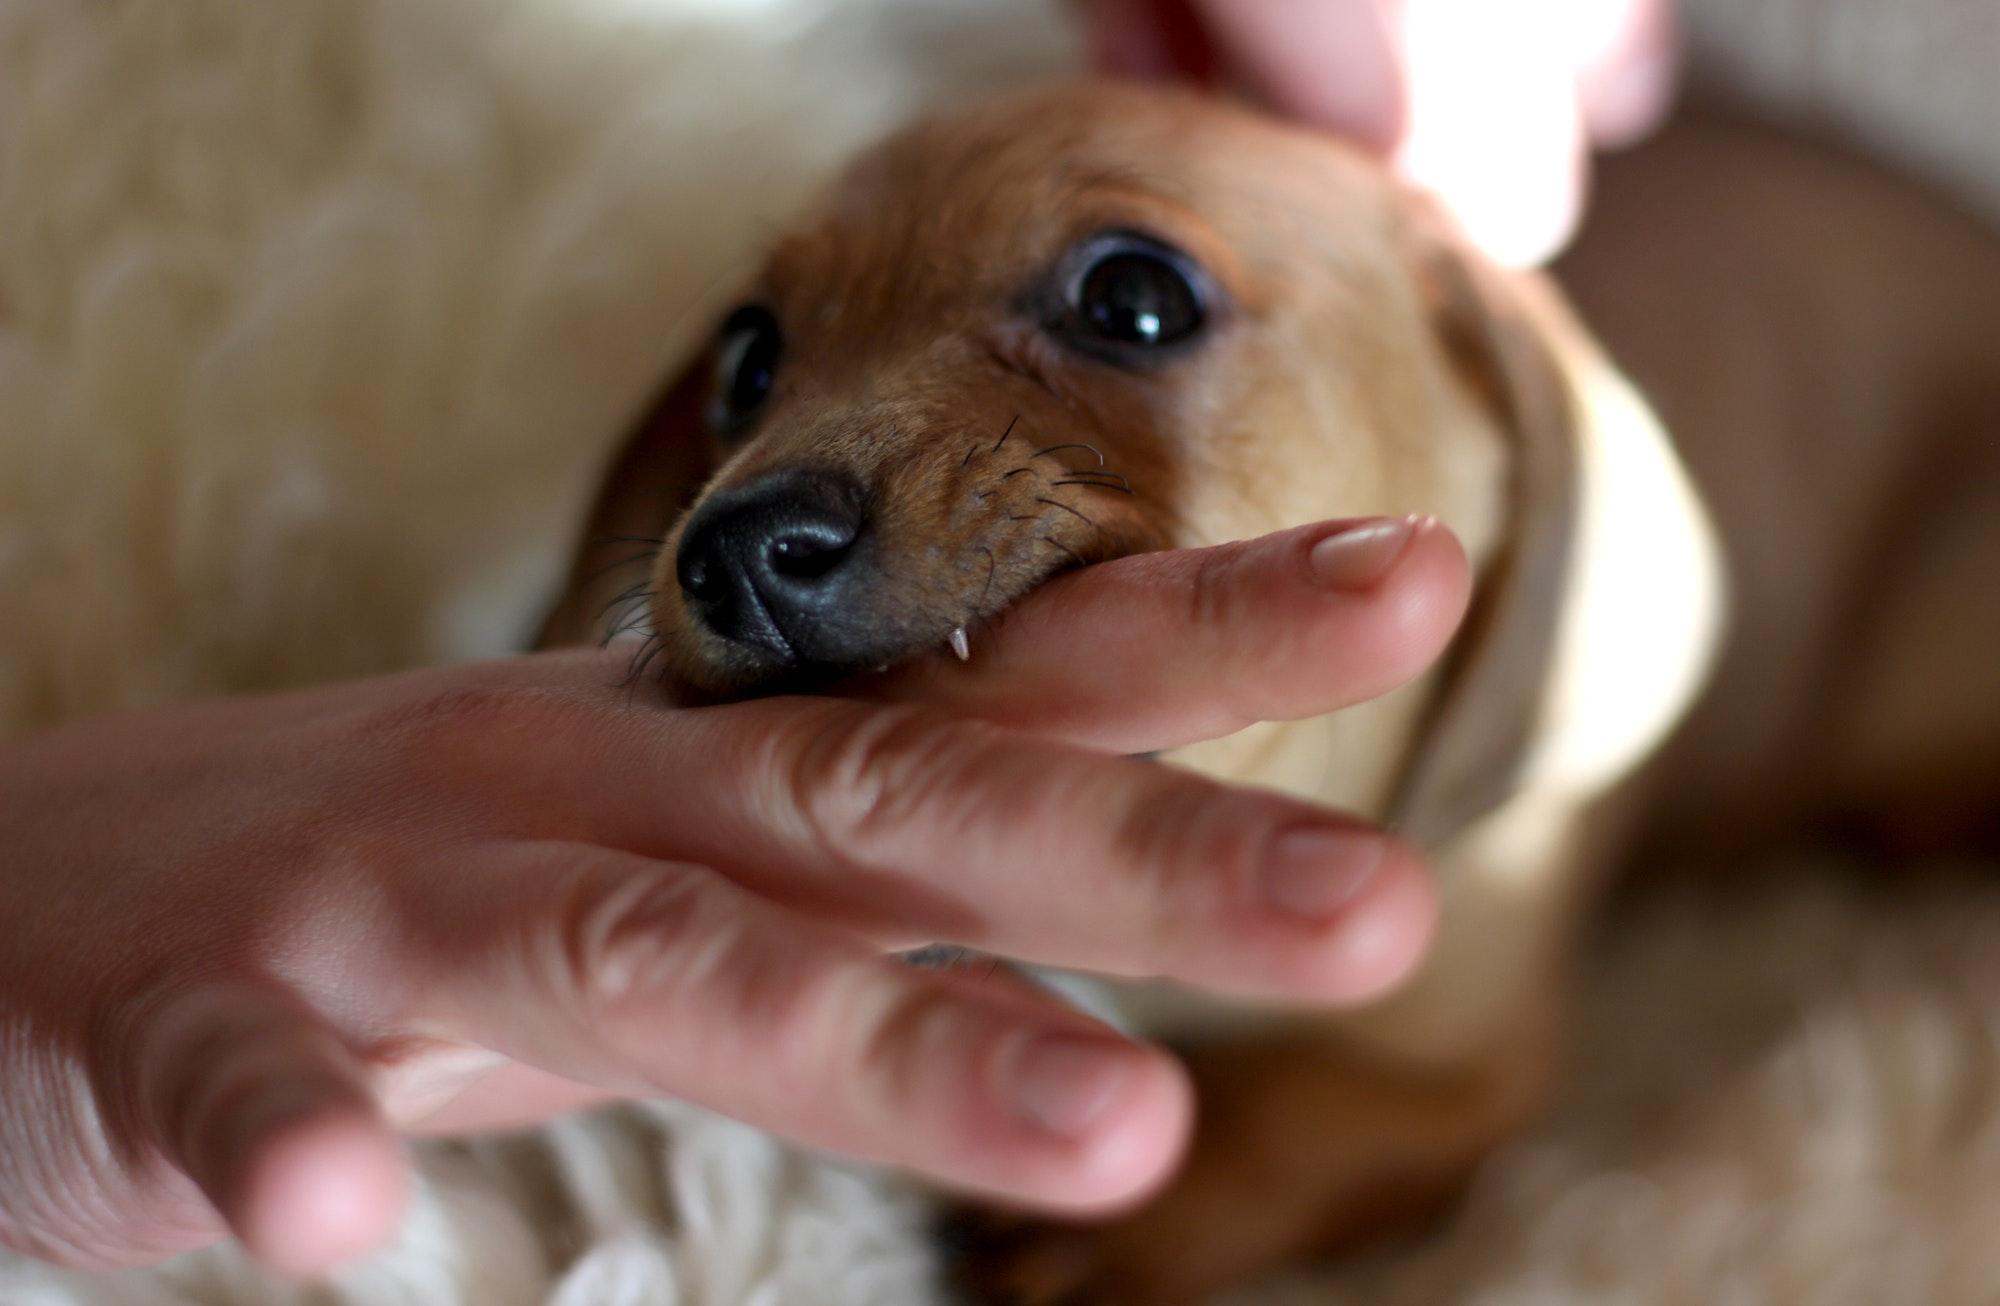 Little dog bite, close up